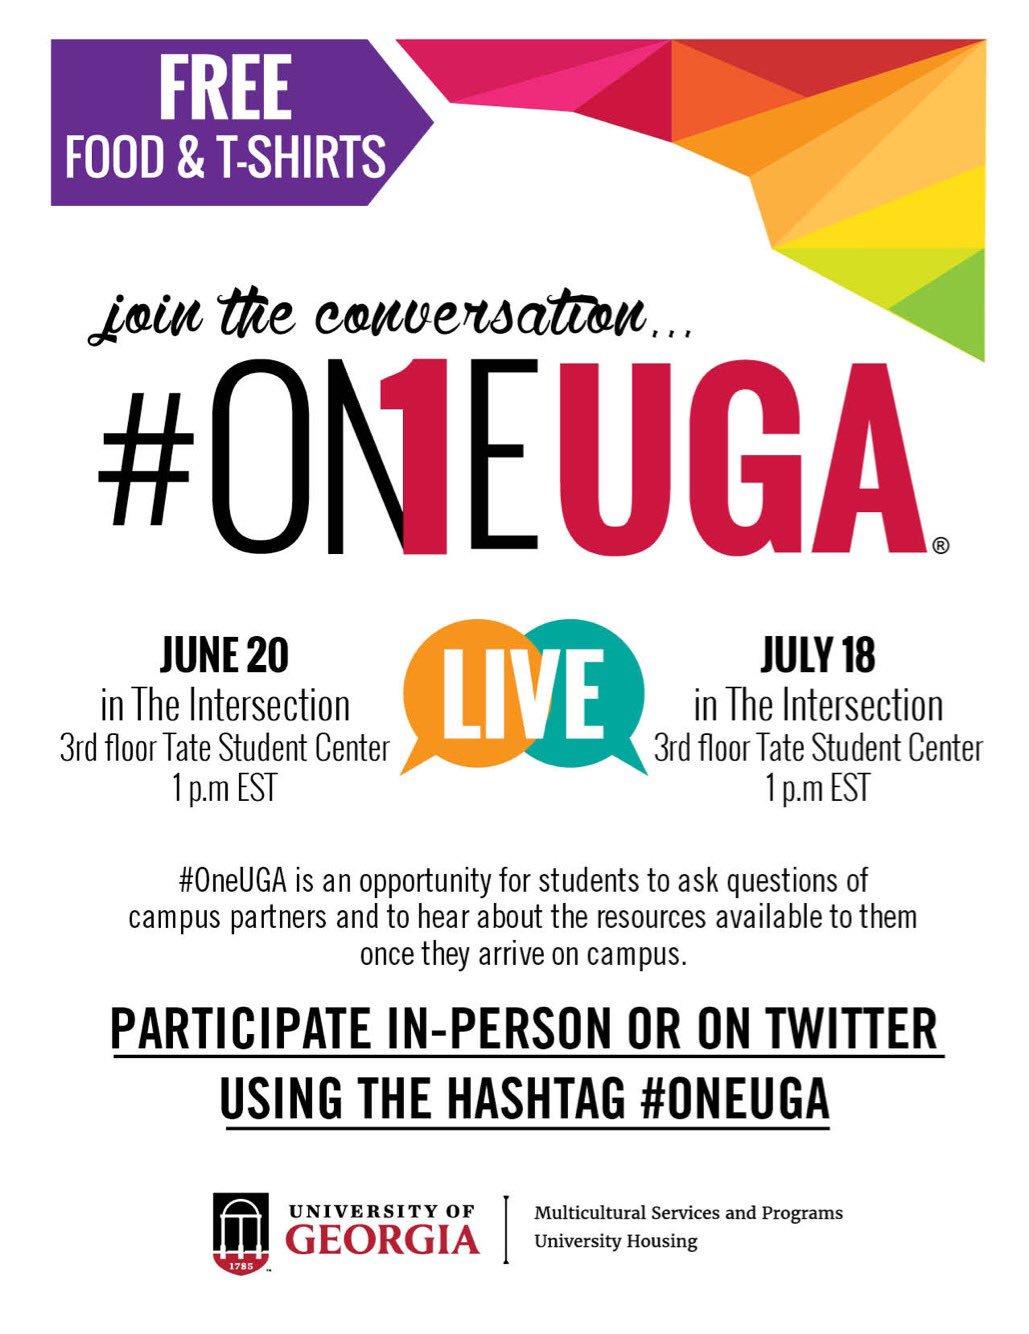 Thumbnail for #OneUGA June 20, 2017